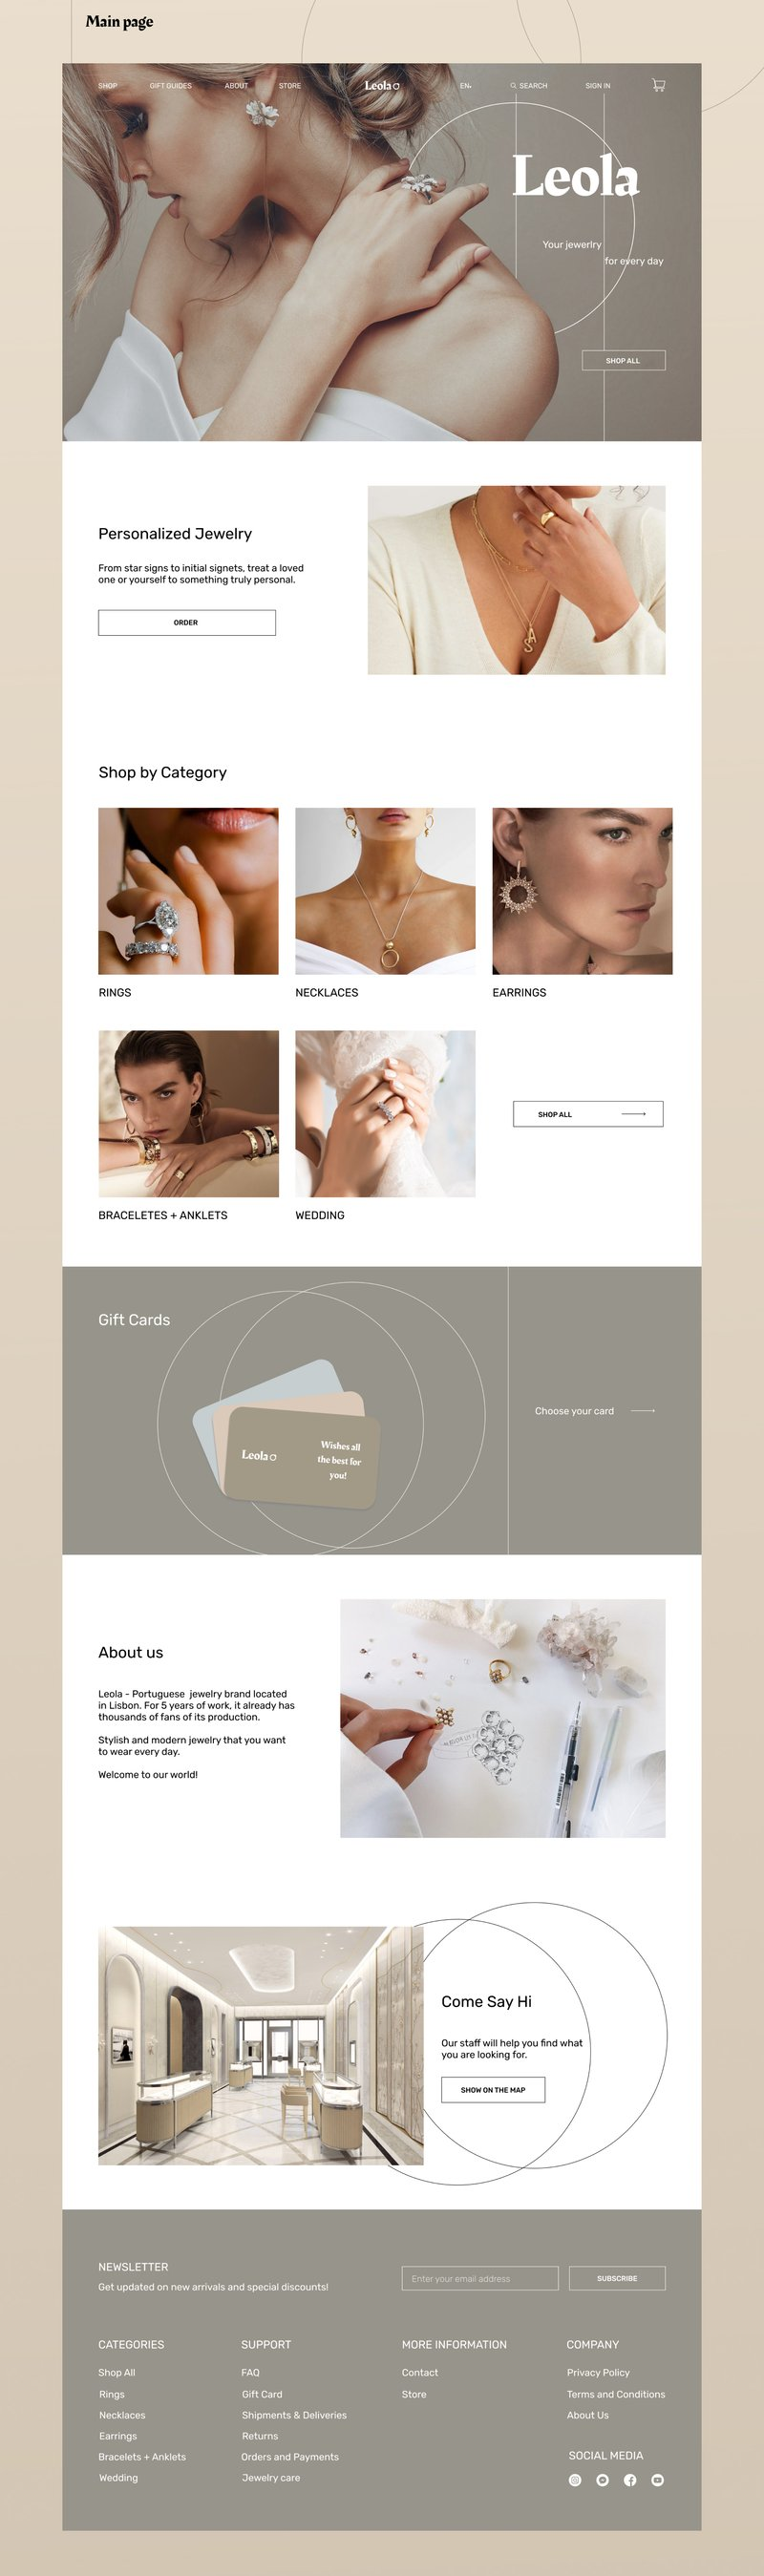 E-commerece - Jewelry store – work in freelancer's portfolio